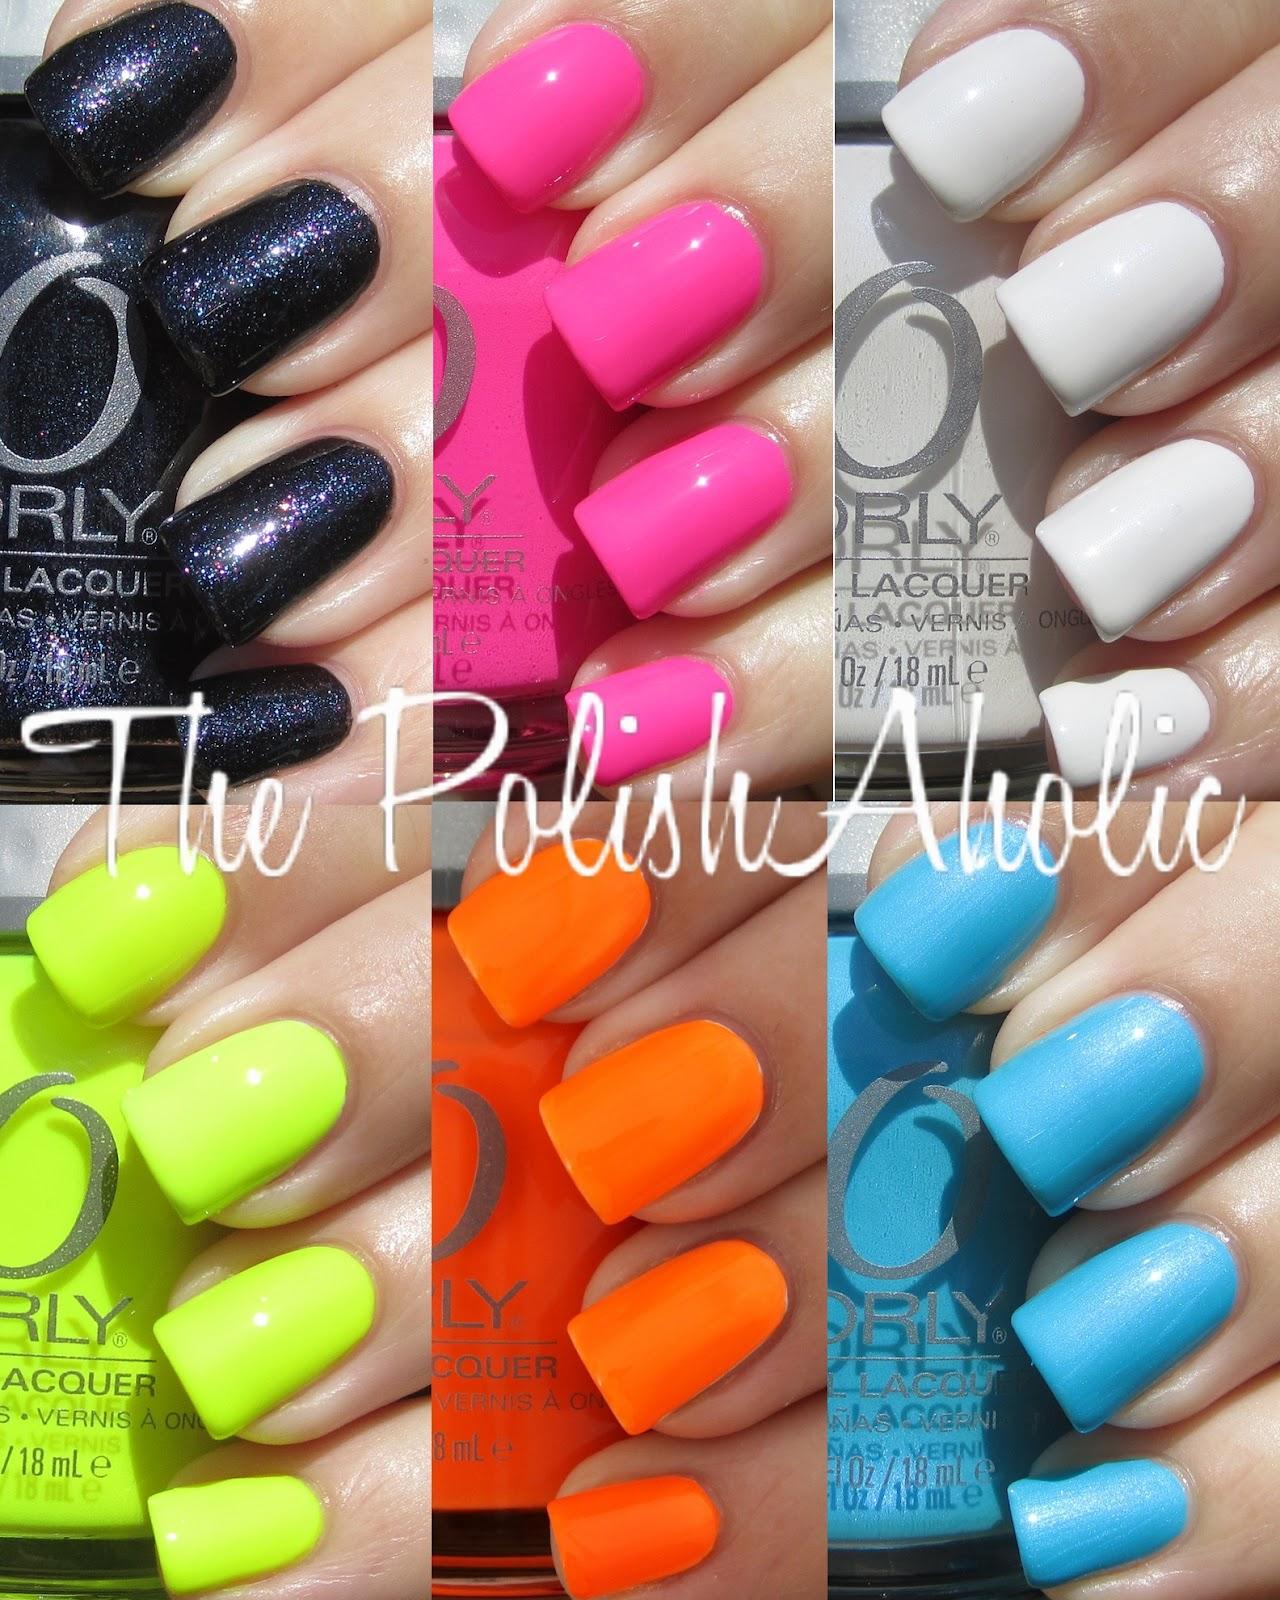 POP OF NEON on Pinterest | Neon, Neon Yellow and Neon Sandals